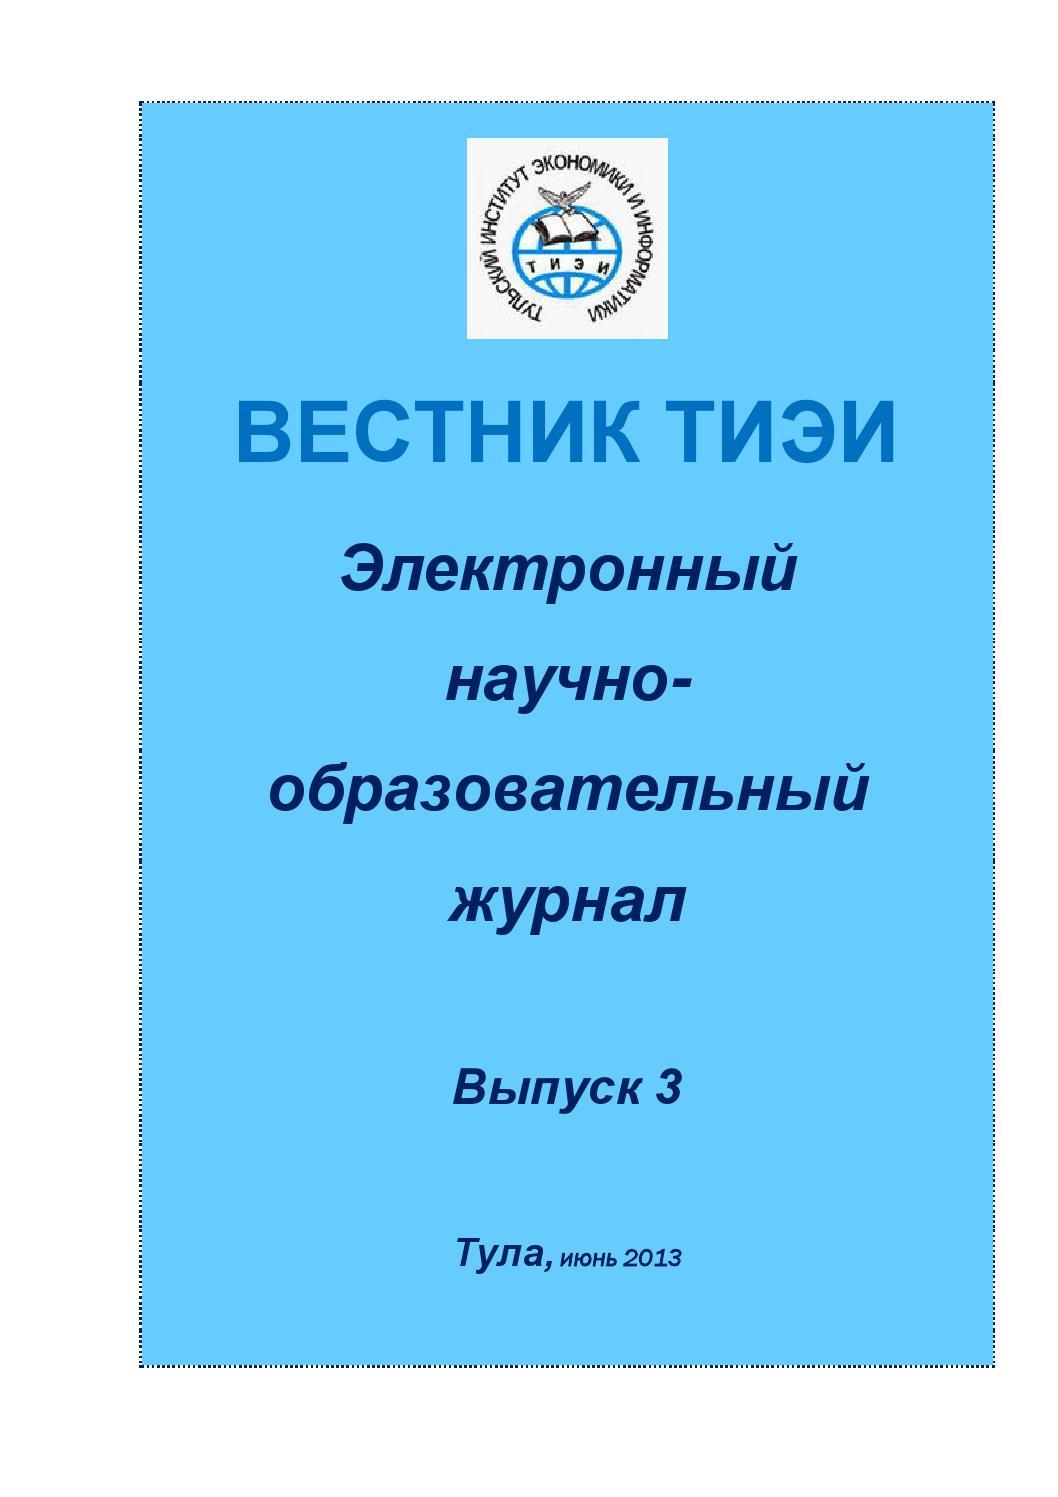 Оптимизация сайта Солнечная улица (деревня Зименки) прогон xrumer 2-я улица Энтузиастов